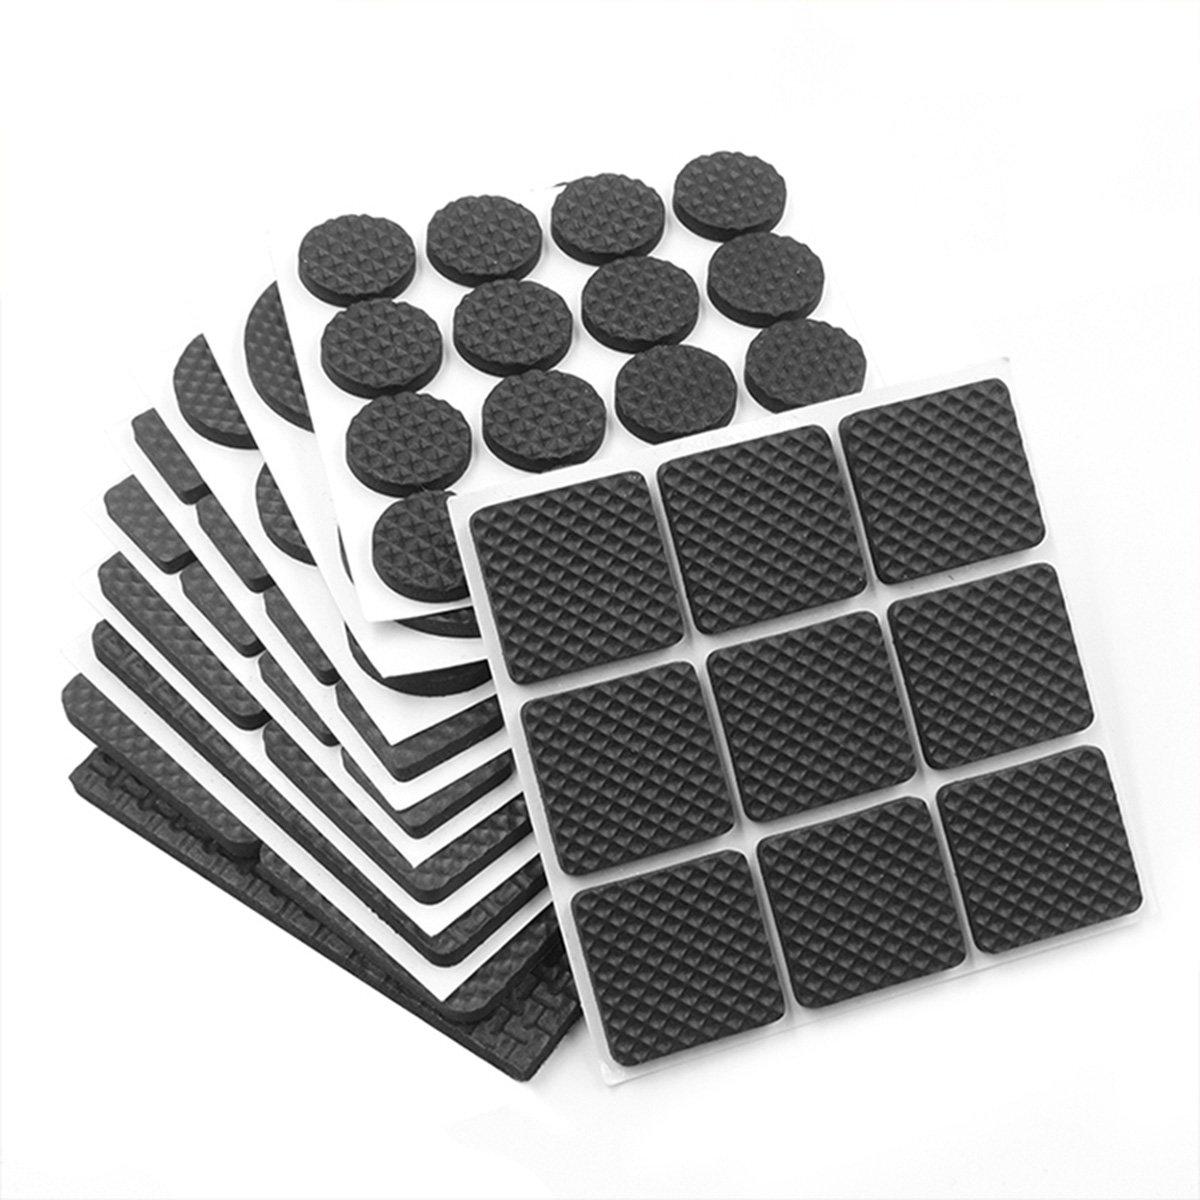 Naisidier Premium Non Slip Furniture Pads, 276Pcs Adhesive Desk Chair Leg Covers Hardwood Floor Protectors, Black